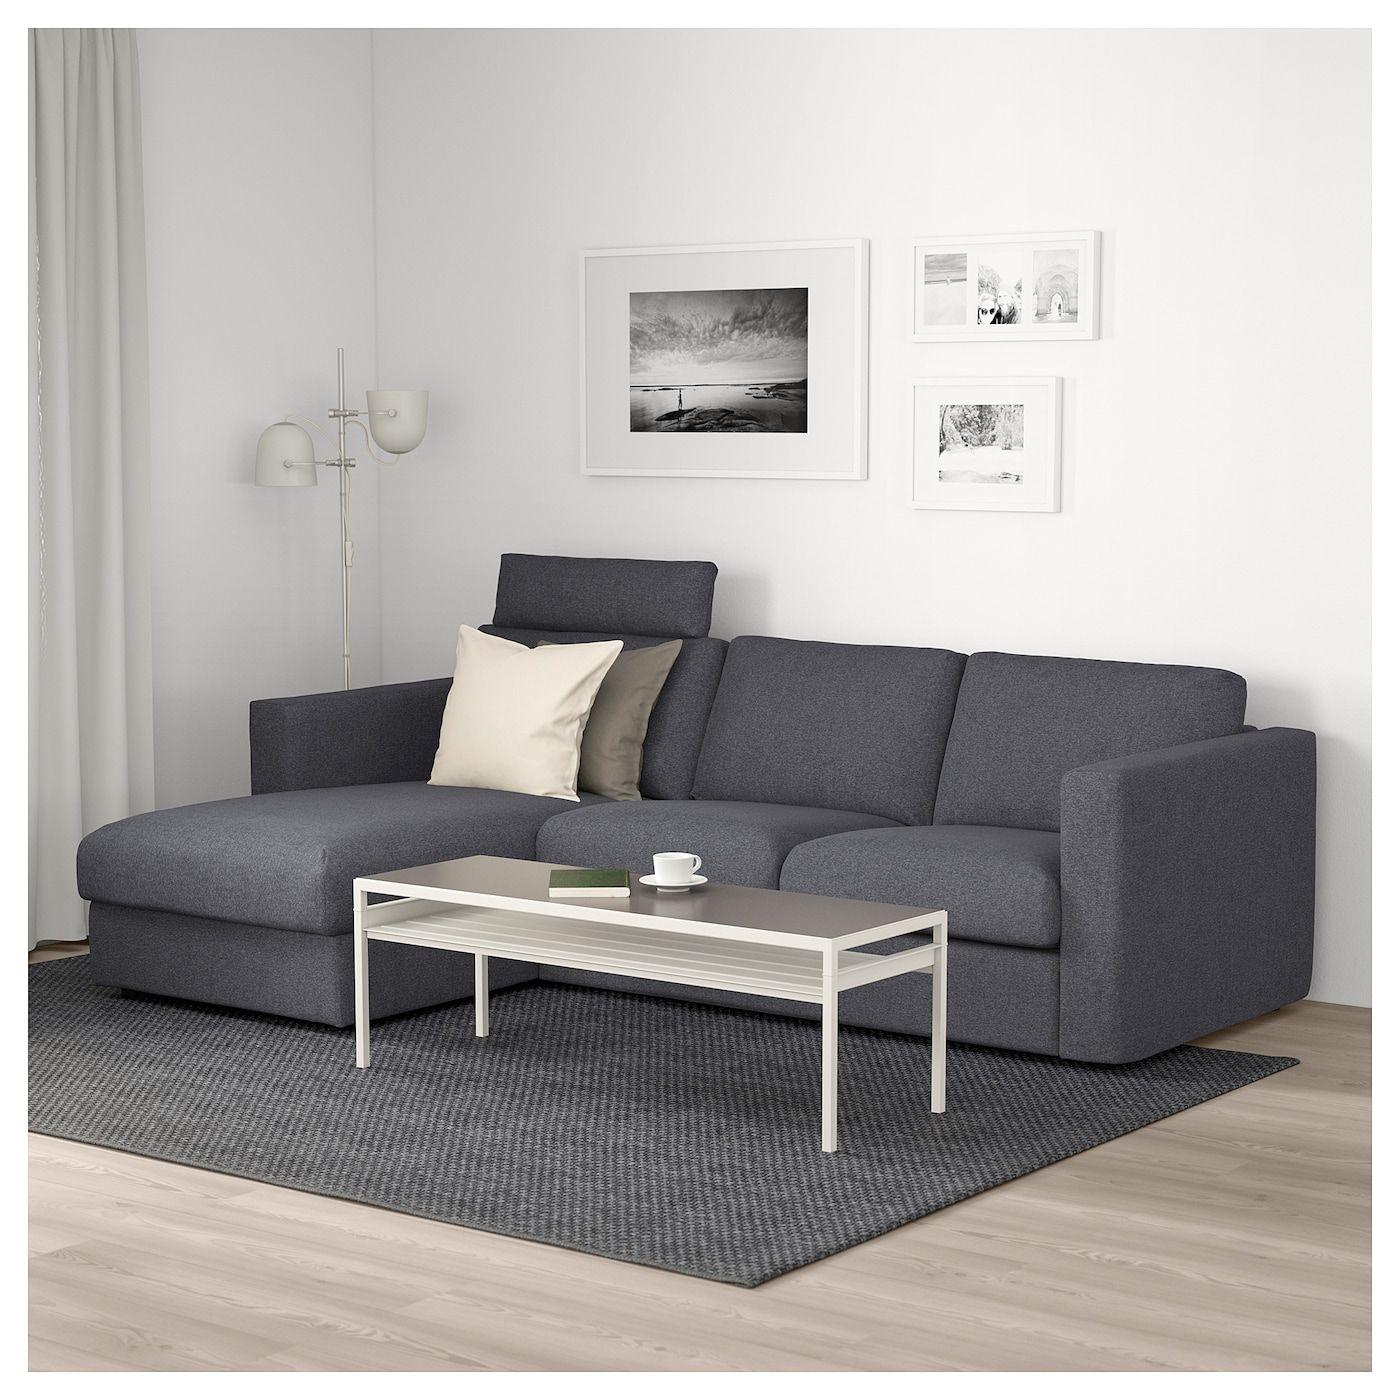 Vimle 3er Sofa Mit Recamiere Mit Nackenkissen Gunnared Mittelgrau Ikea Deutschland Three Seat Sofa Ikea Vimle Sofa Sofa